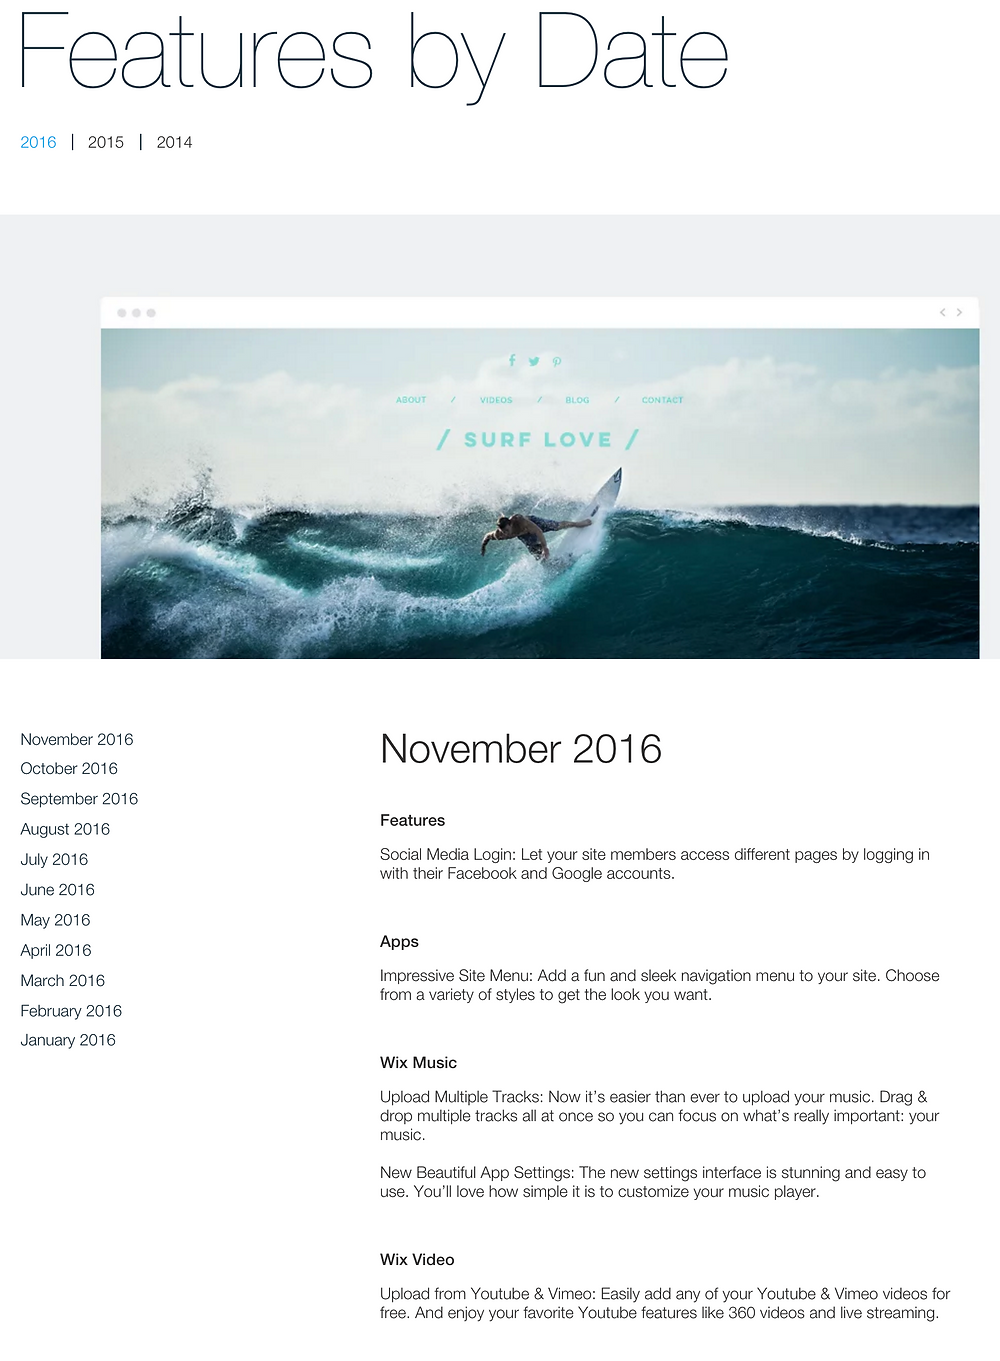 Denver Wix Web Designer – Recent Wix Feature Releases